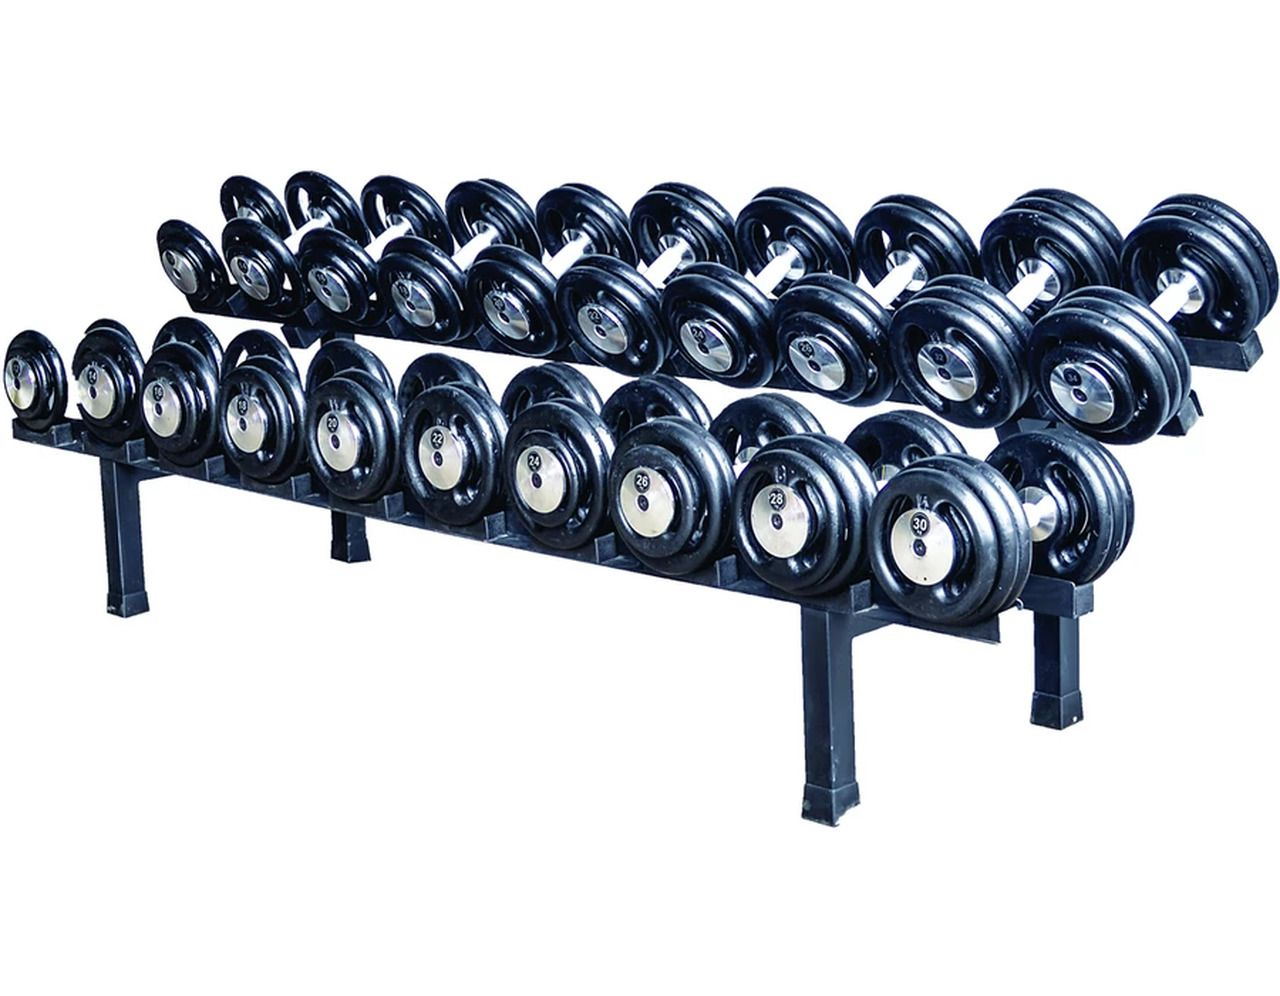 Suporte Expositor de Dumbbells para  10 Pares  - Panela de Ferro Fundido